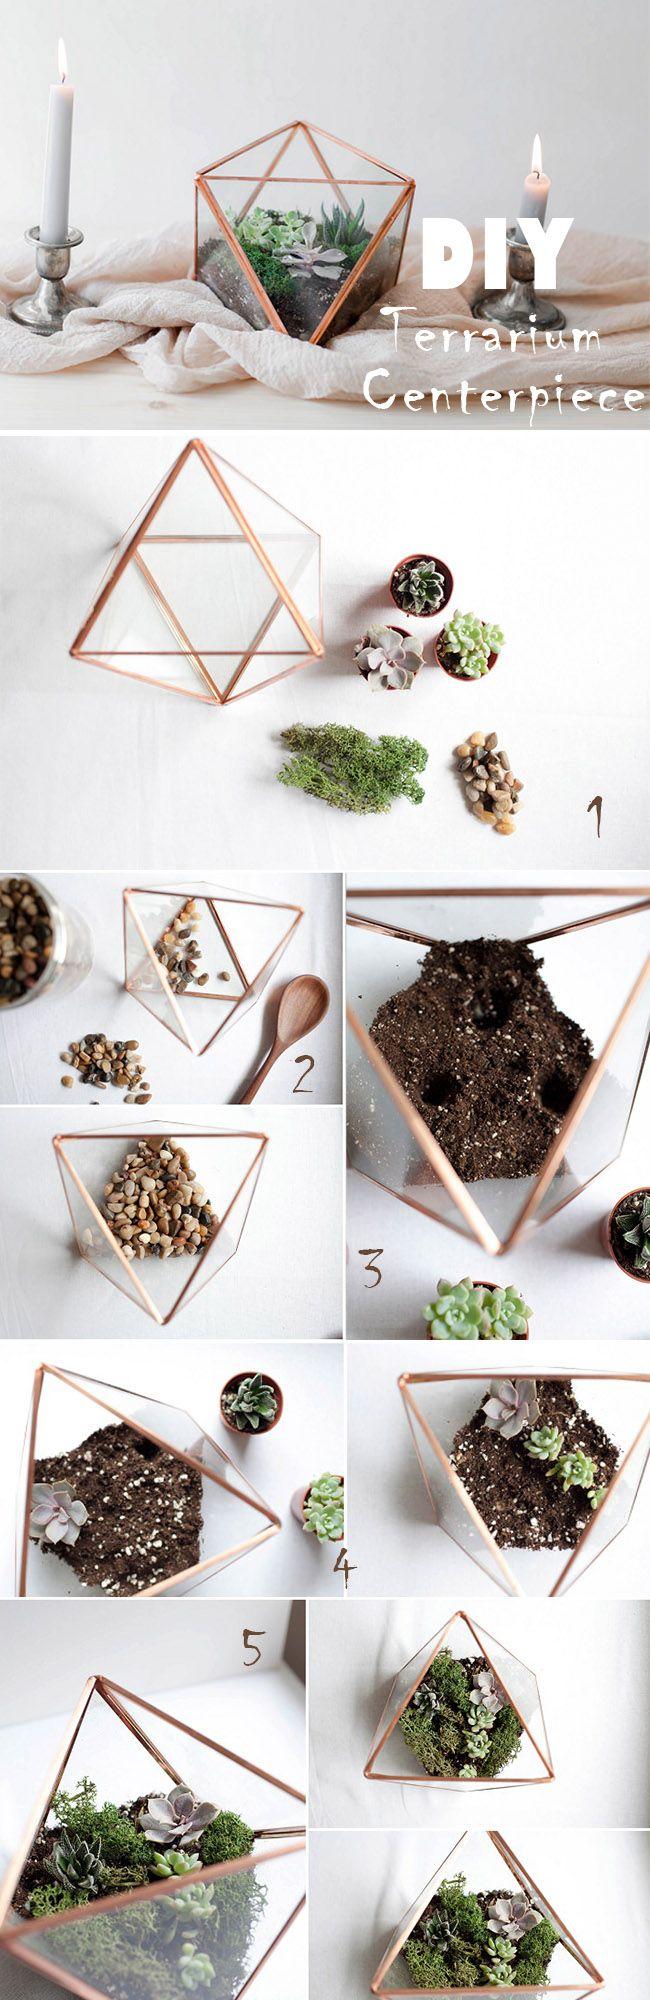 useful diy wedding ideas with tutorials in clean organize